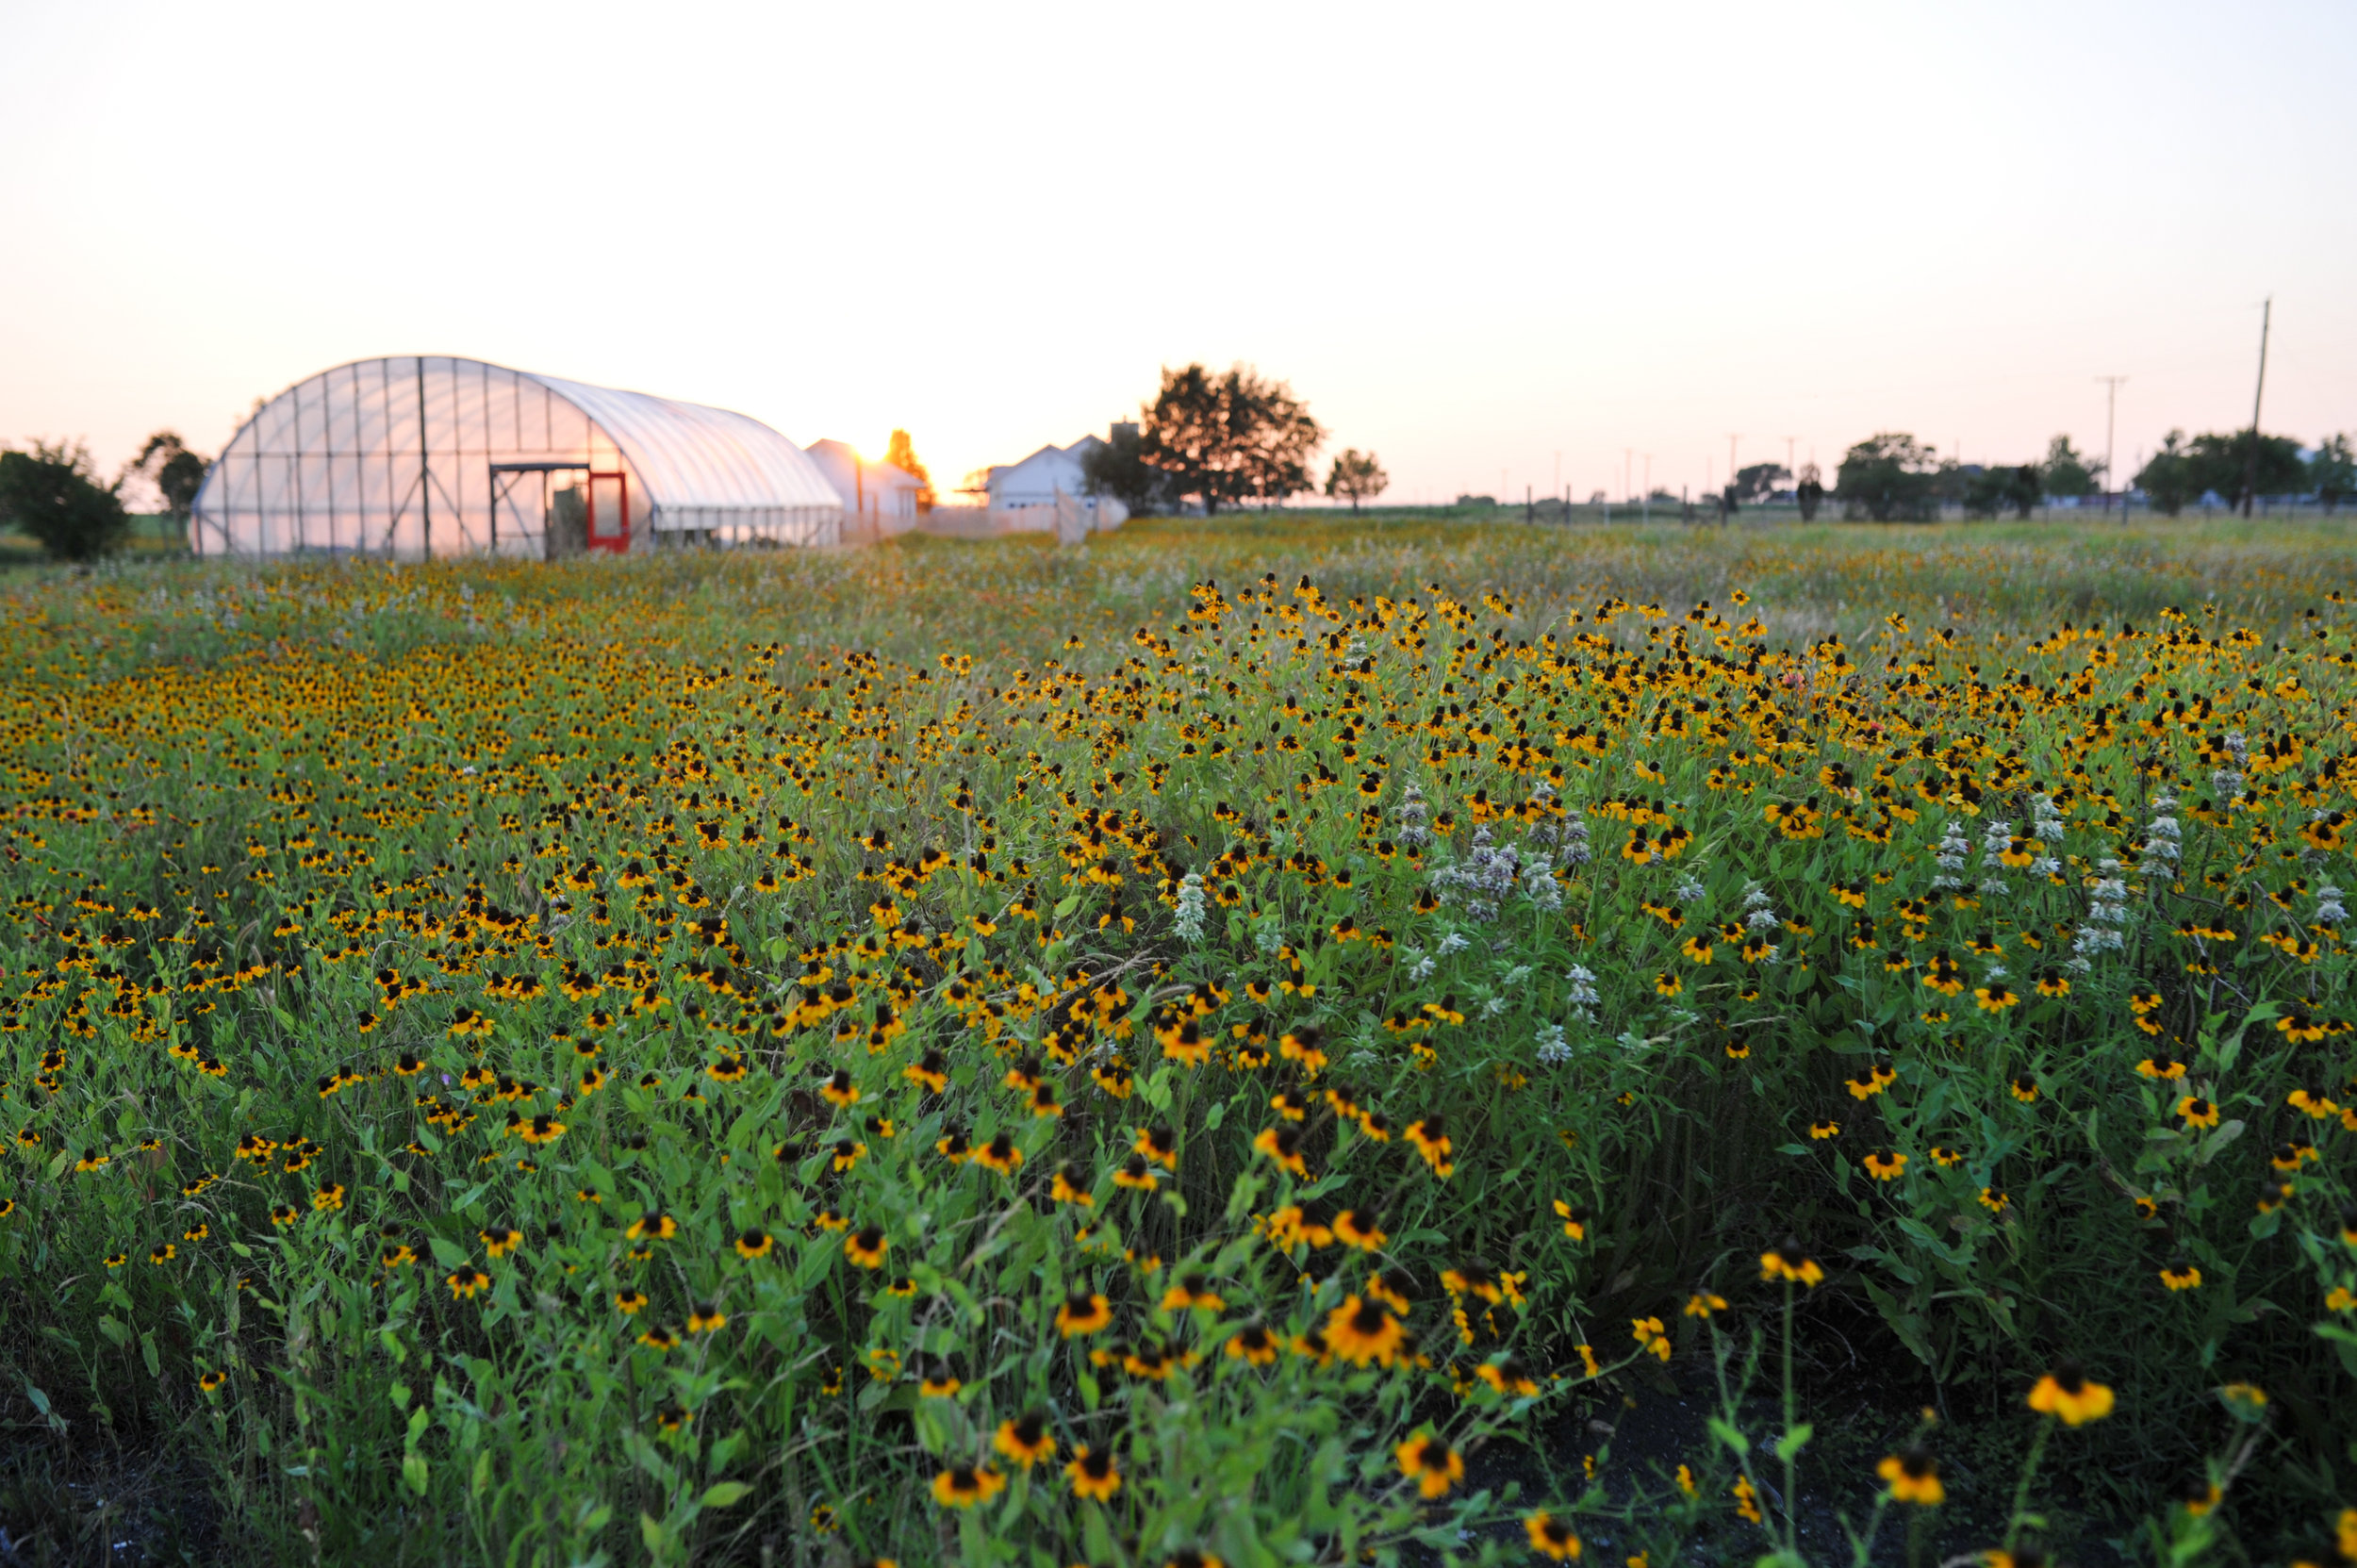 Grassdale wildflowers copy 2.jpg